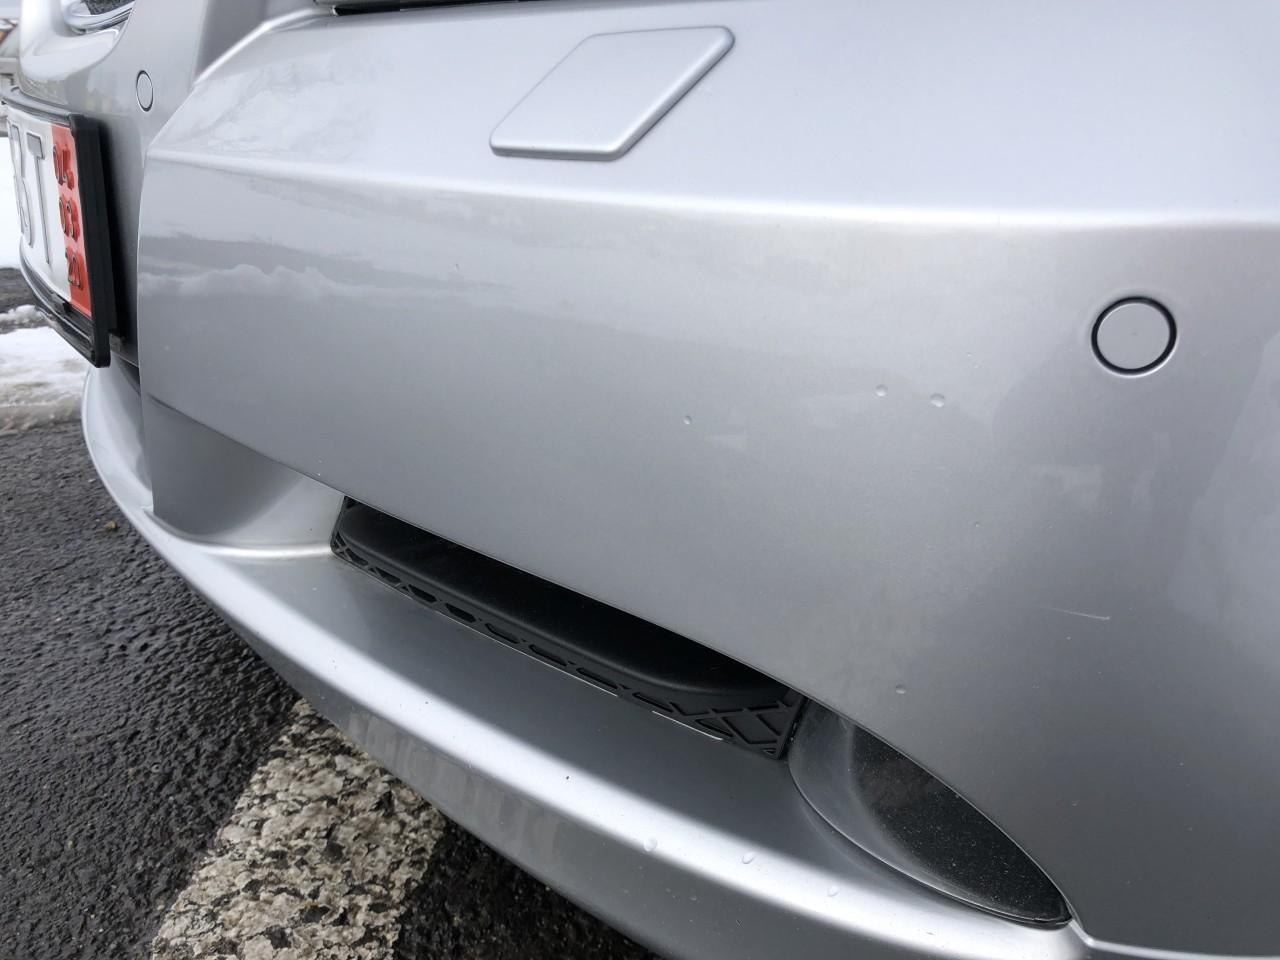 BMW 320 BMW 320D An 2007-163Cp Full/Xenon/Navi/Piele/Automata/Trapa/Bluetooth/PDC fata+spate/6 CD/Oglinzi rabatabile/Lumini ambientale/Scaune incalzite, etc… Recent adusa din Germania!!! 2007